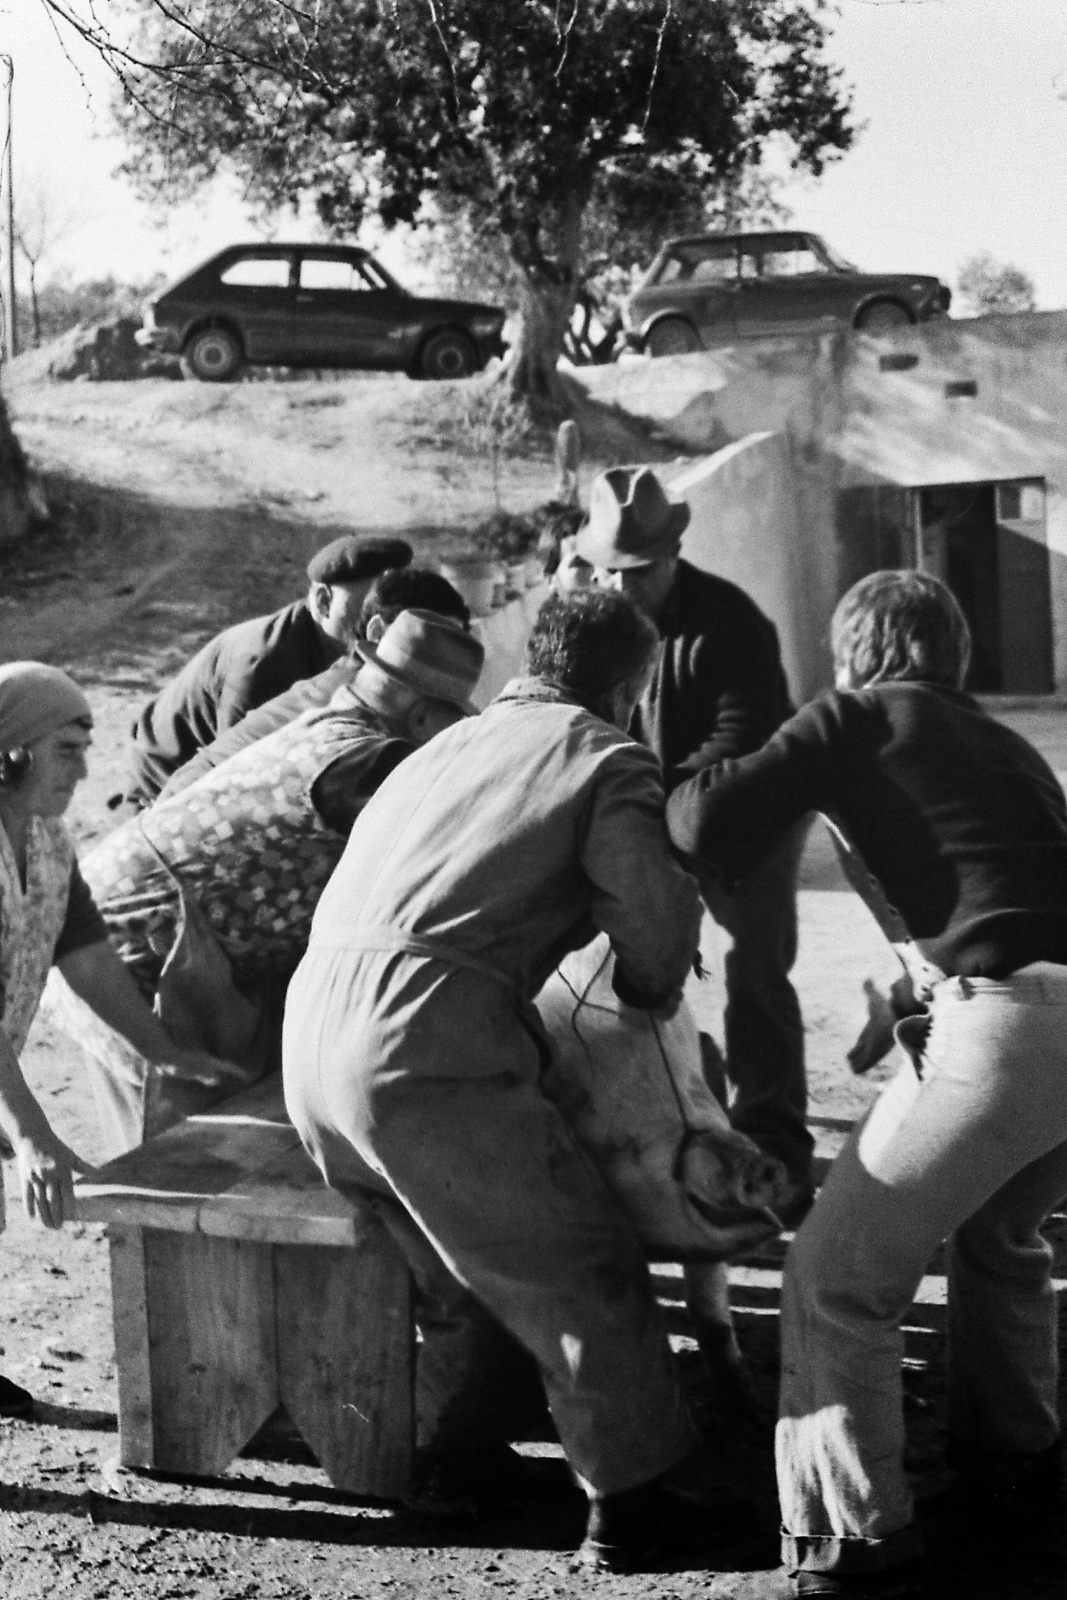 Suinicidio (1979)